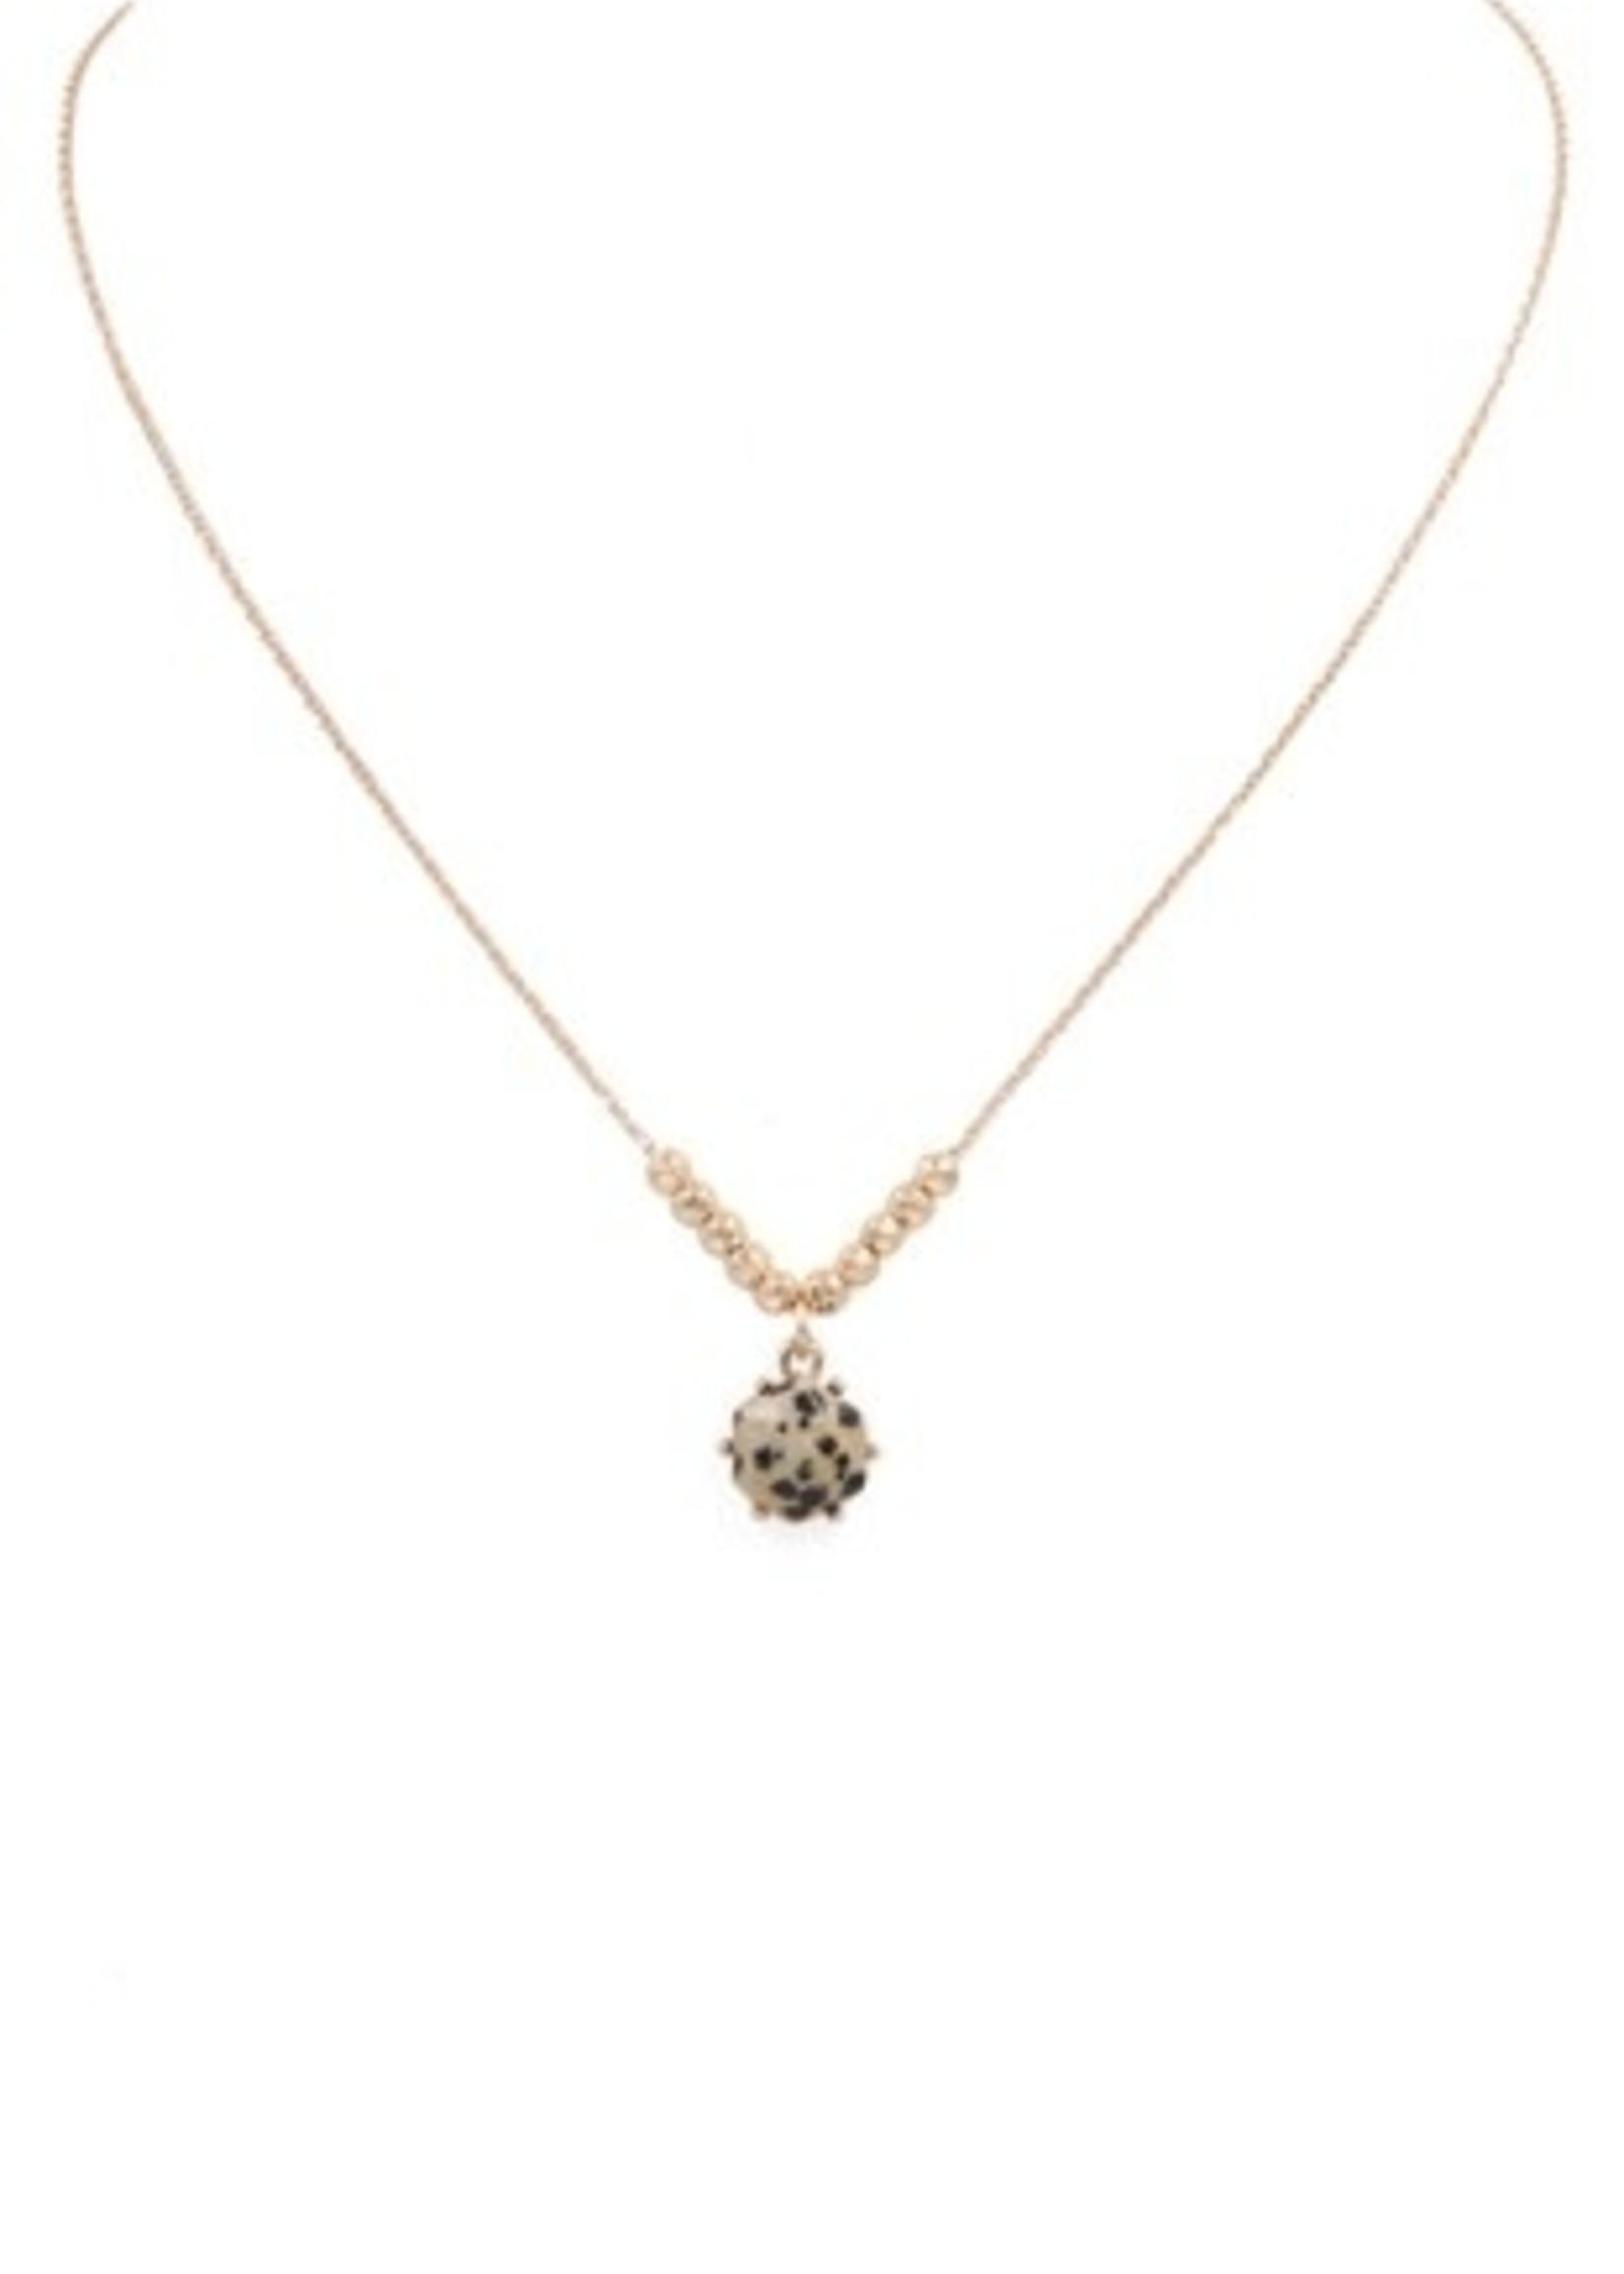 Dalmatian stone pendant